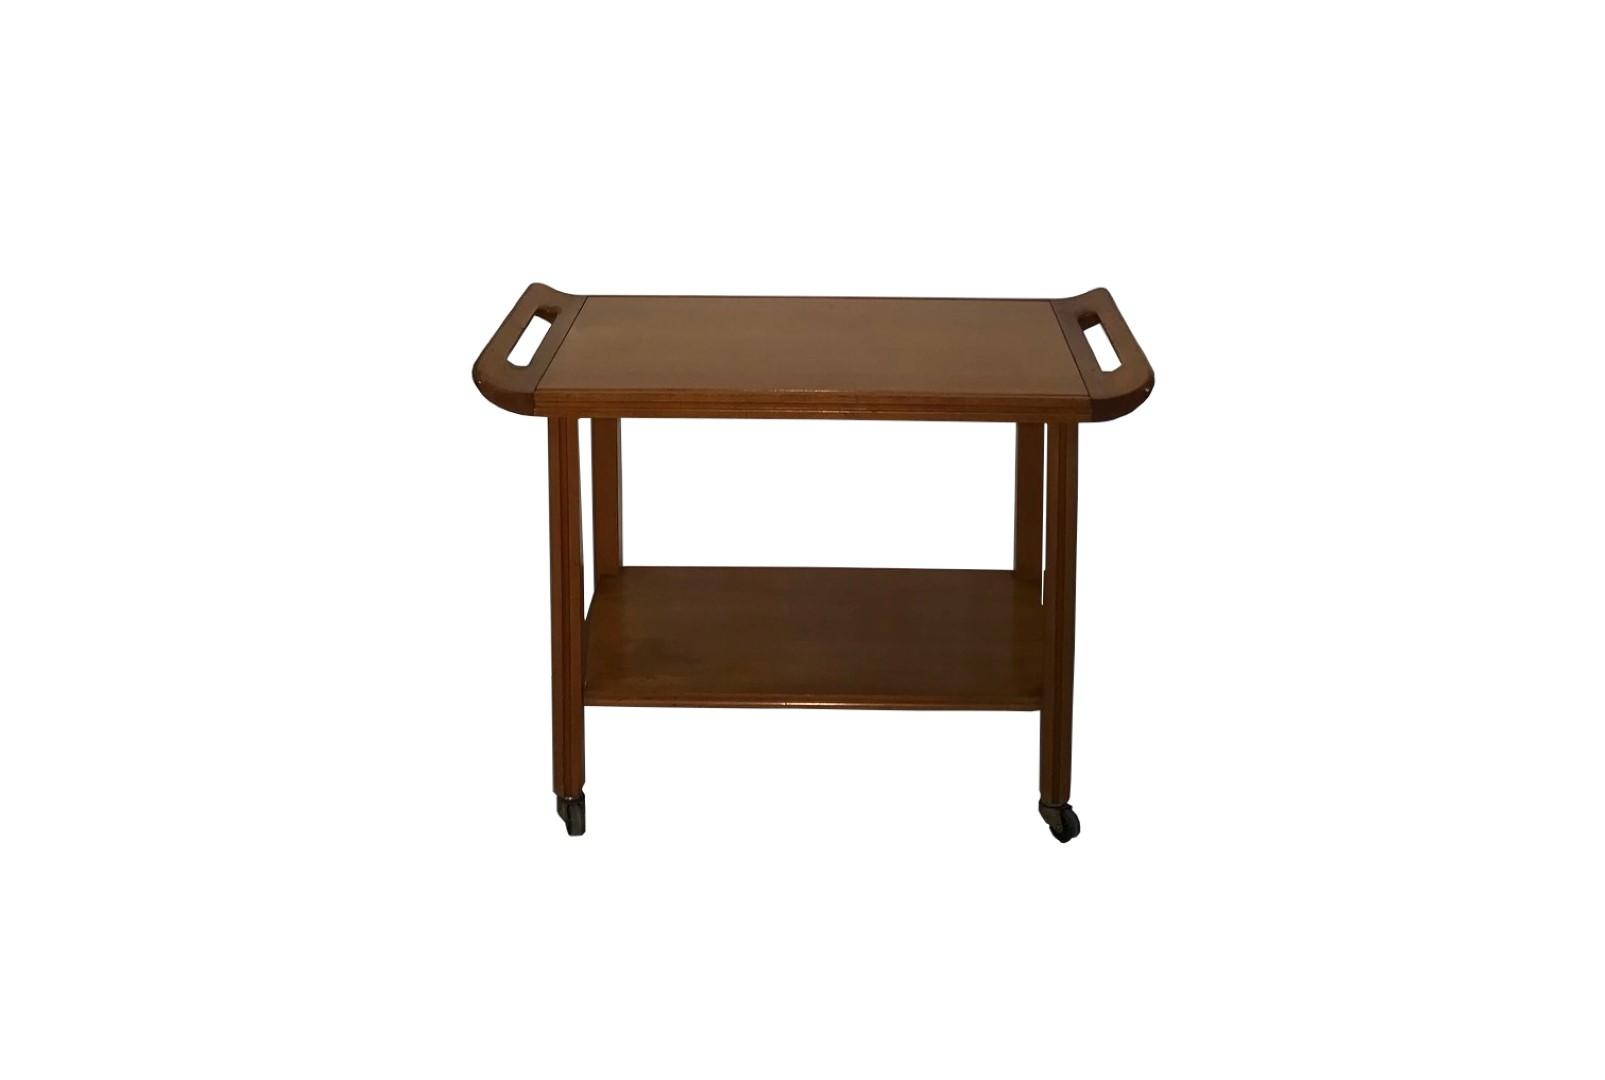 1950er barwagen daenisches design 2. Black Bedroom Furniture Sets. Home Design Ideas